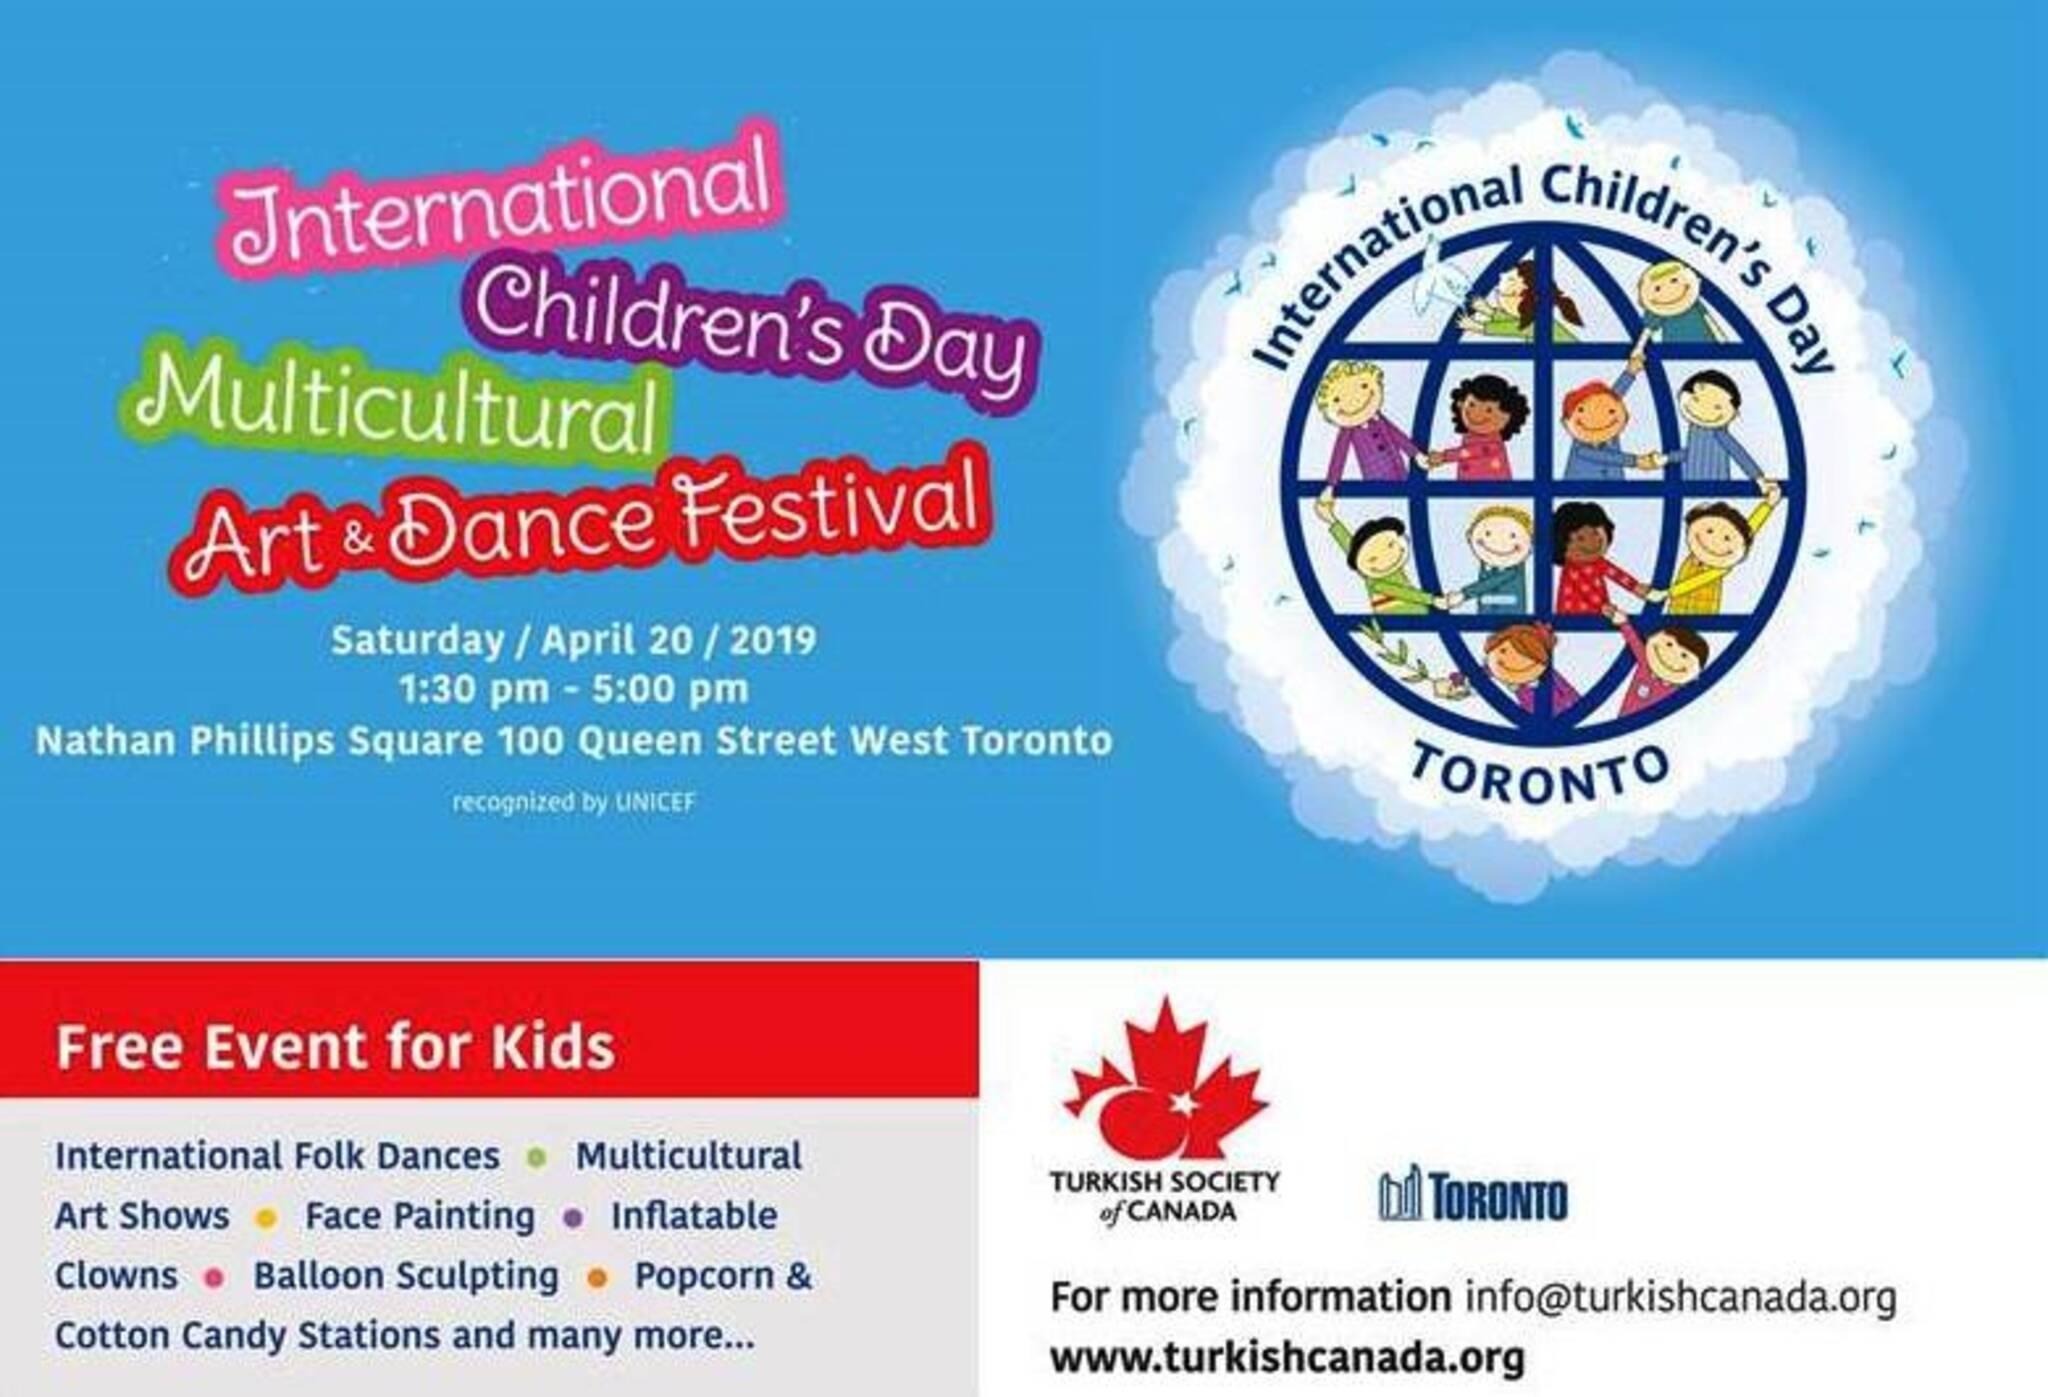 INTERNATIONAL CHILDREN'S DAY MULTICULTURAL DANCE AND ART FESTIVAL